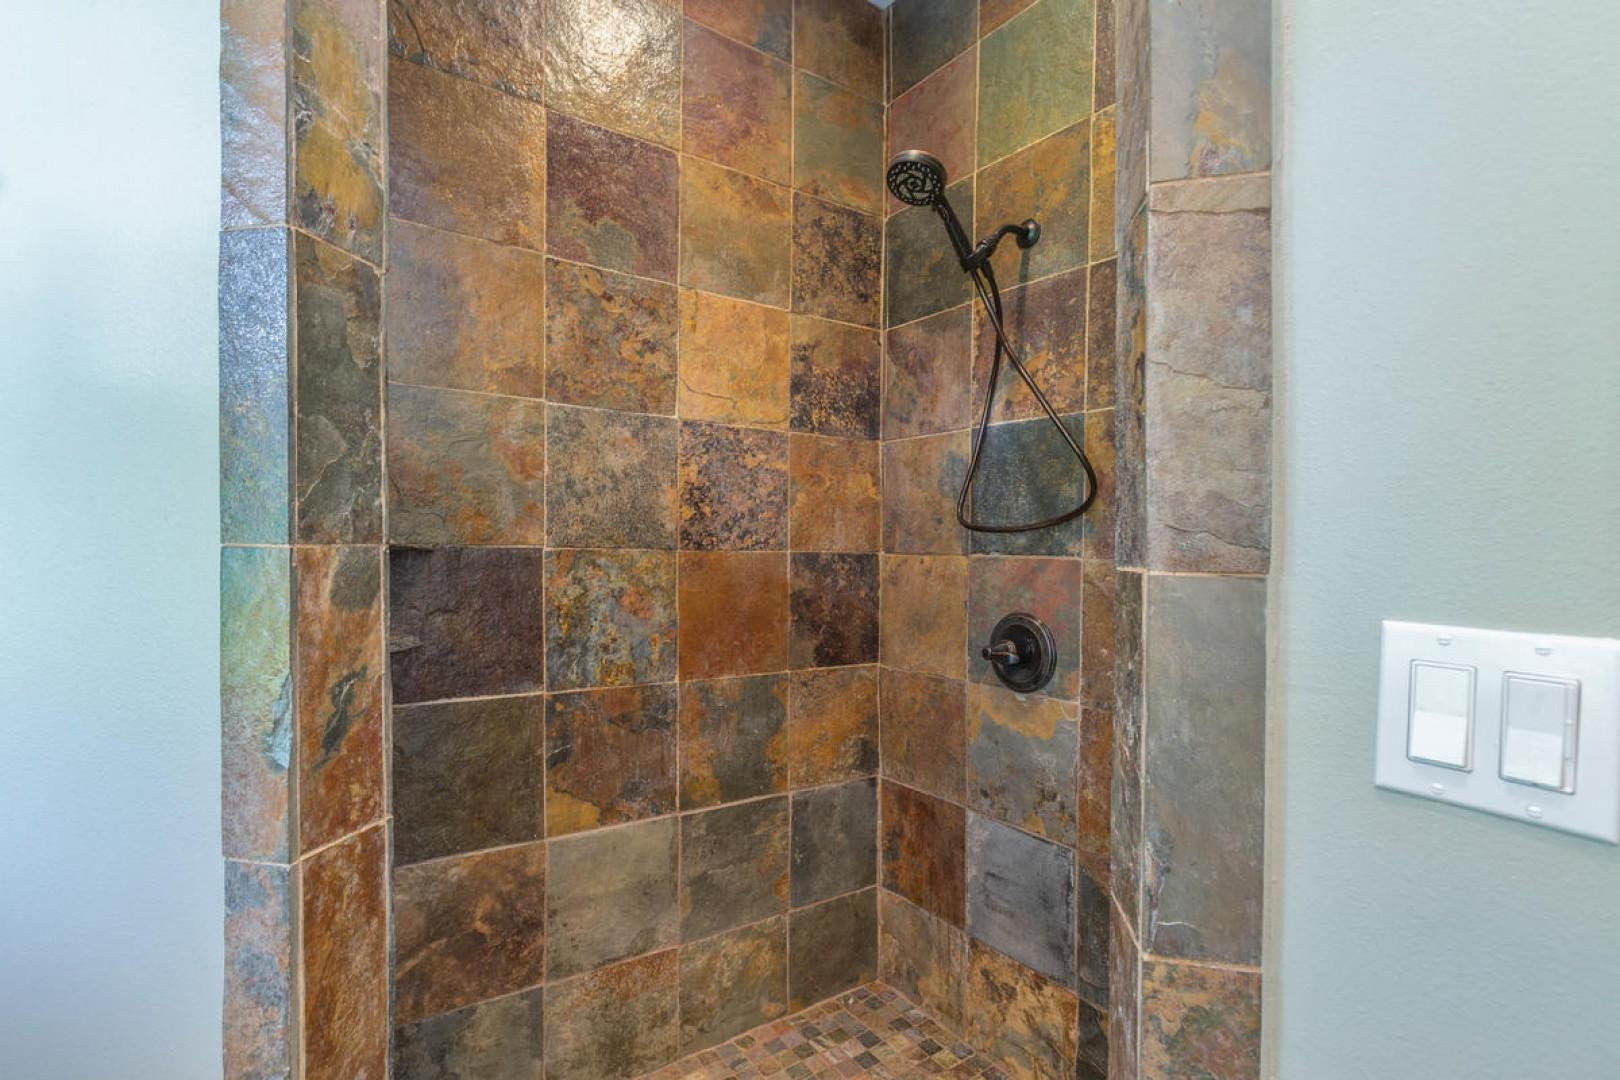 Tile shower in shared bath